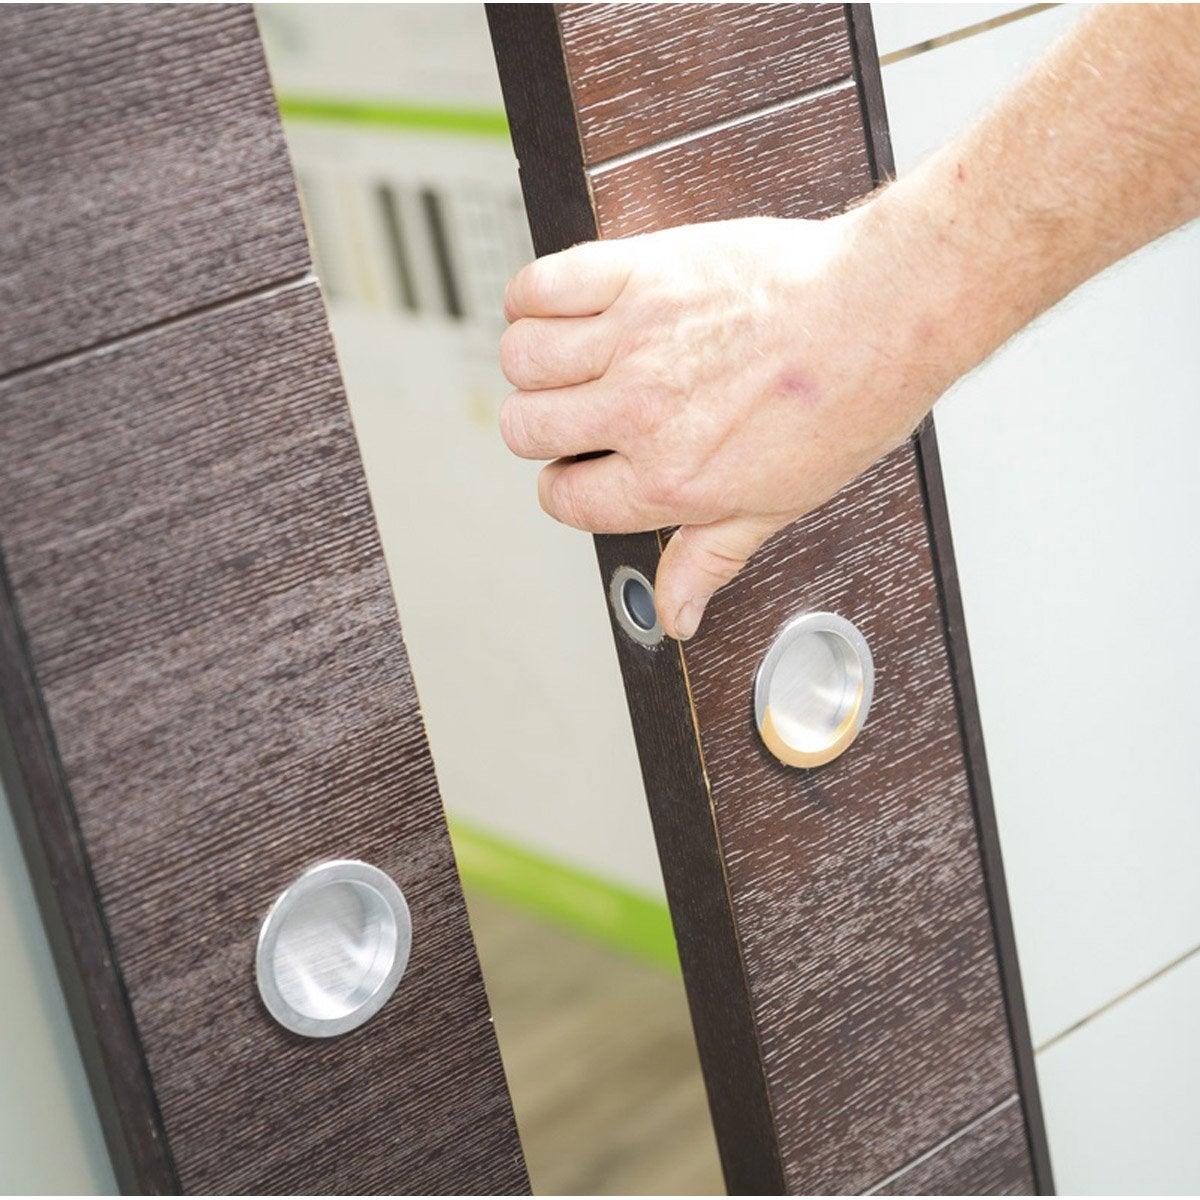 Comment poser une porte galandage leroy merlin - Poser une porte a galandage ...